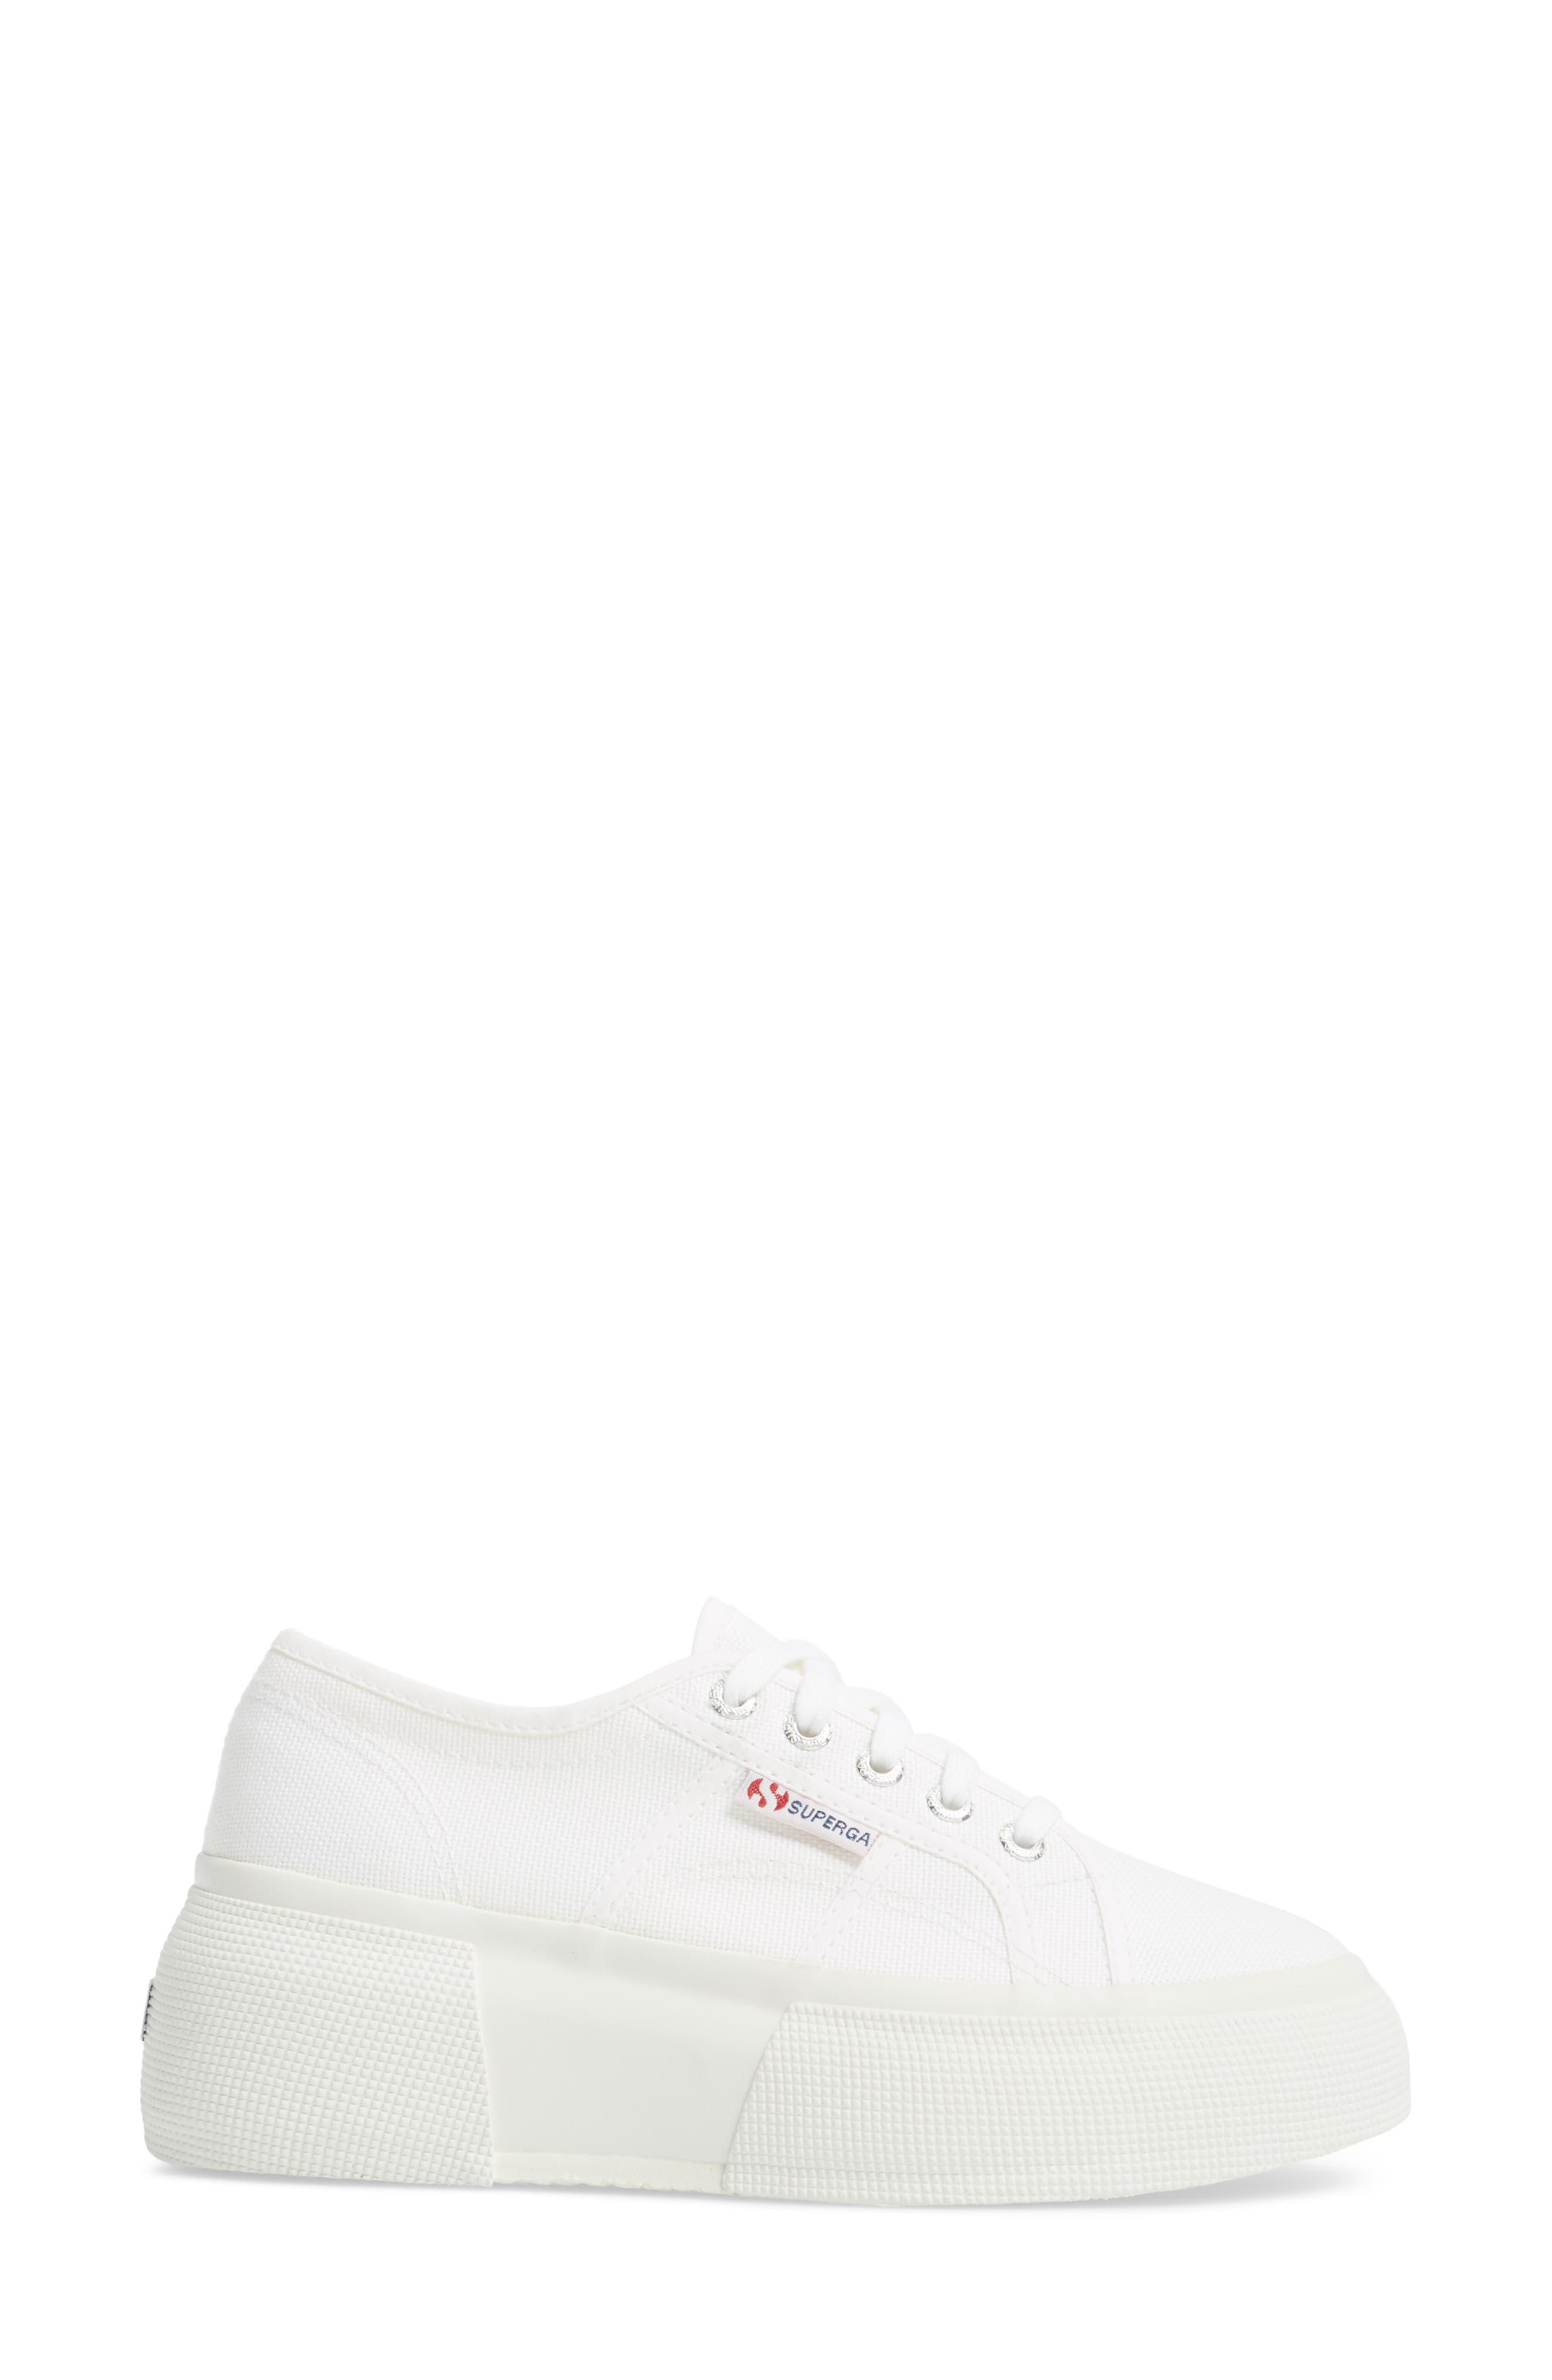 2287 Cotu Platform Sneaker,                             Alternate thumbnail 3, color,                             White